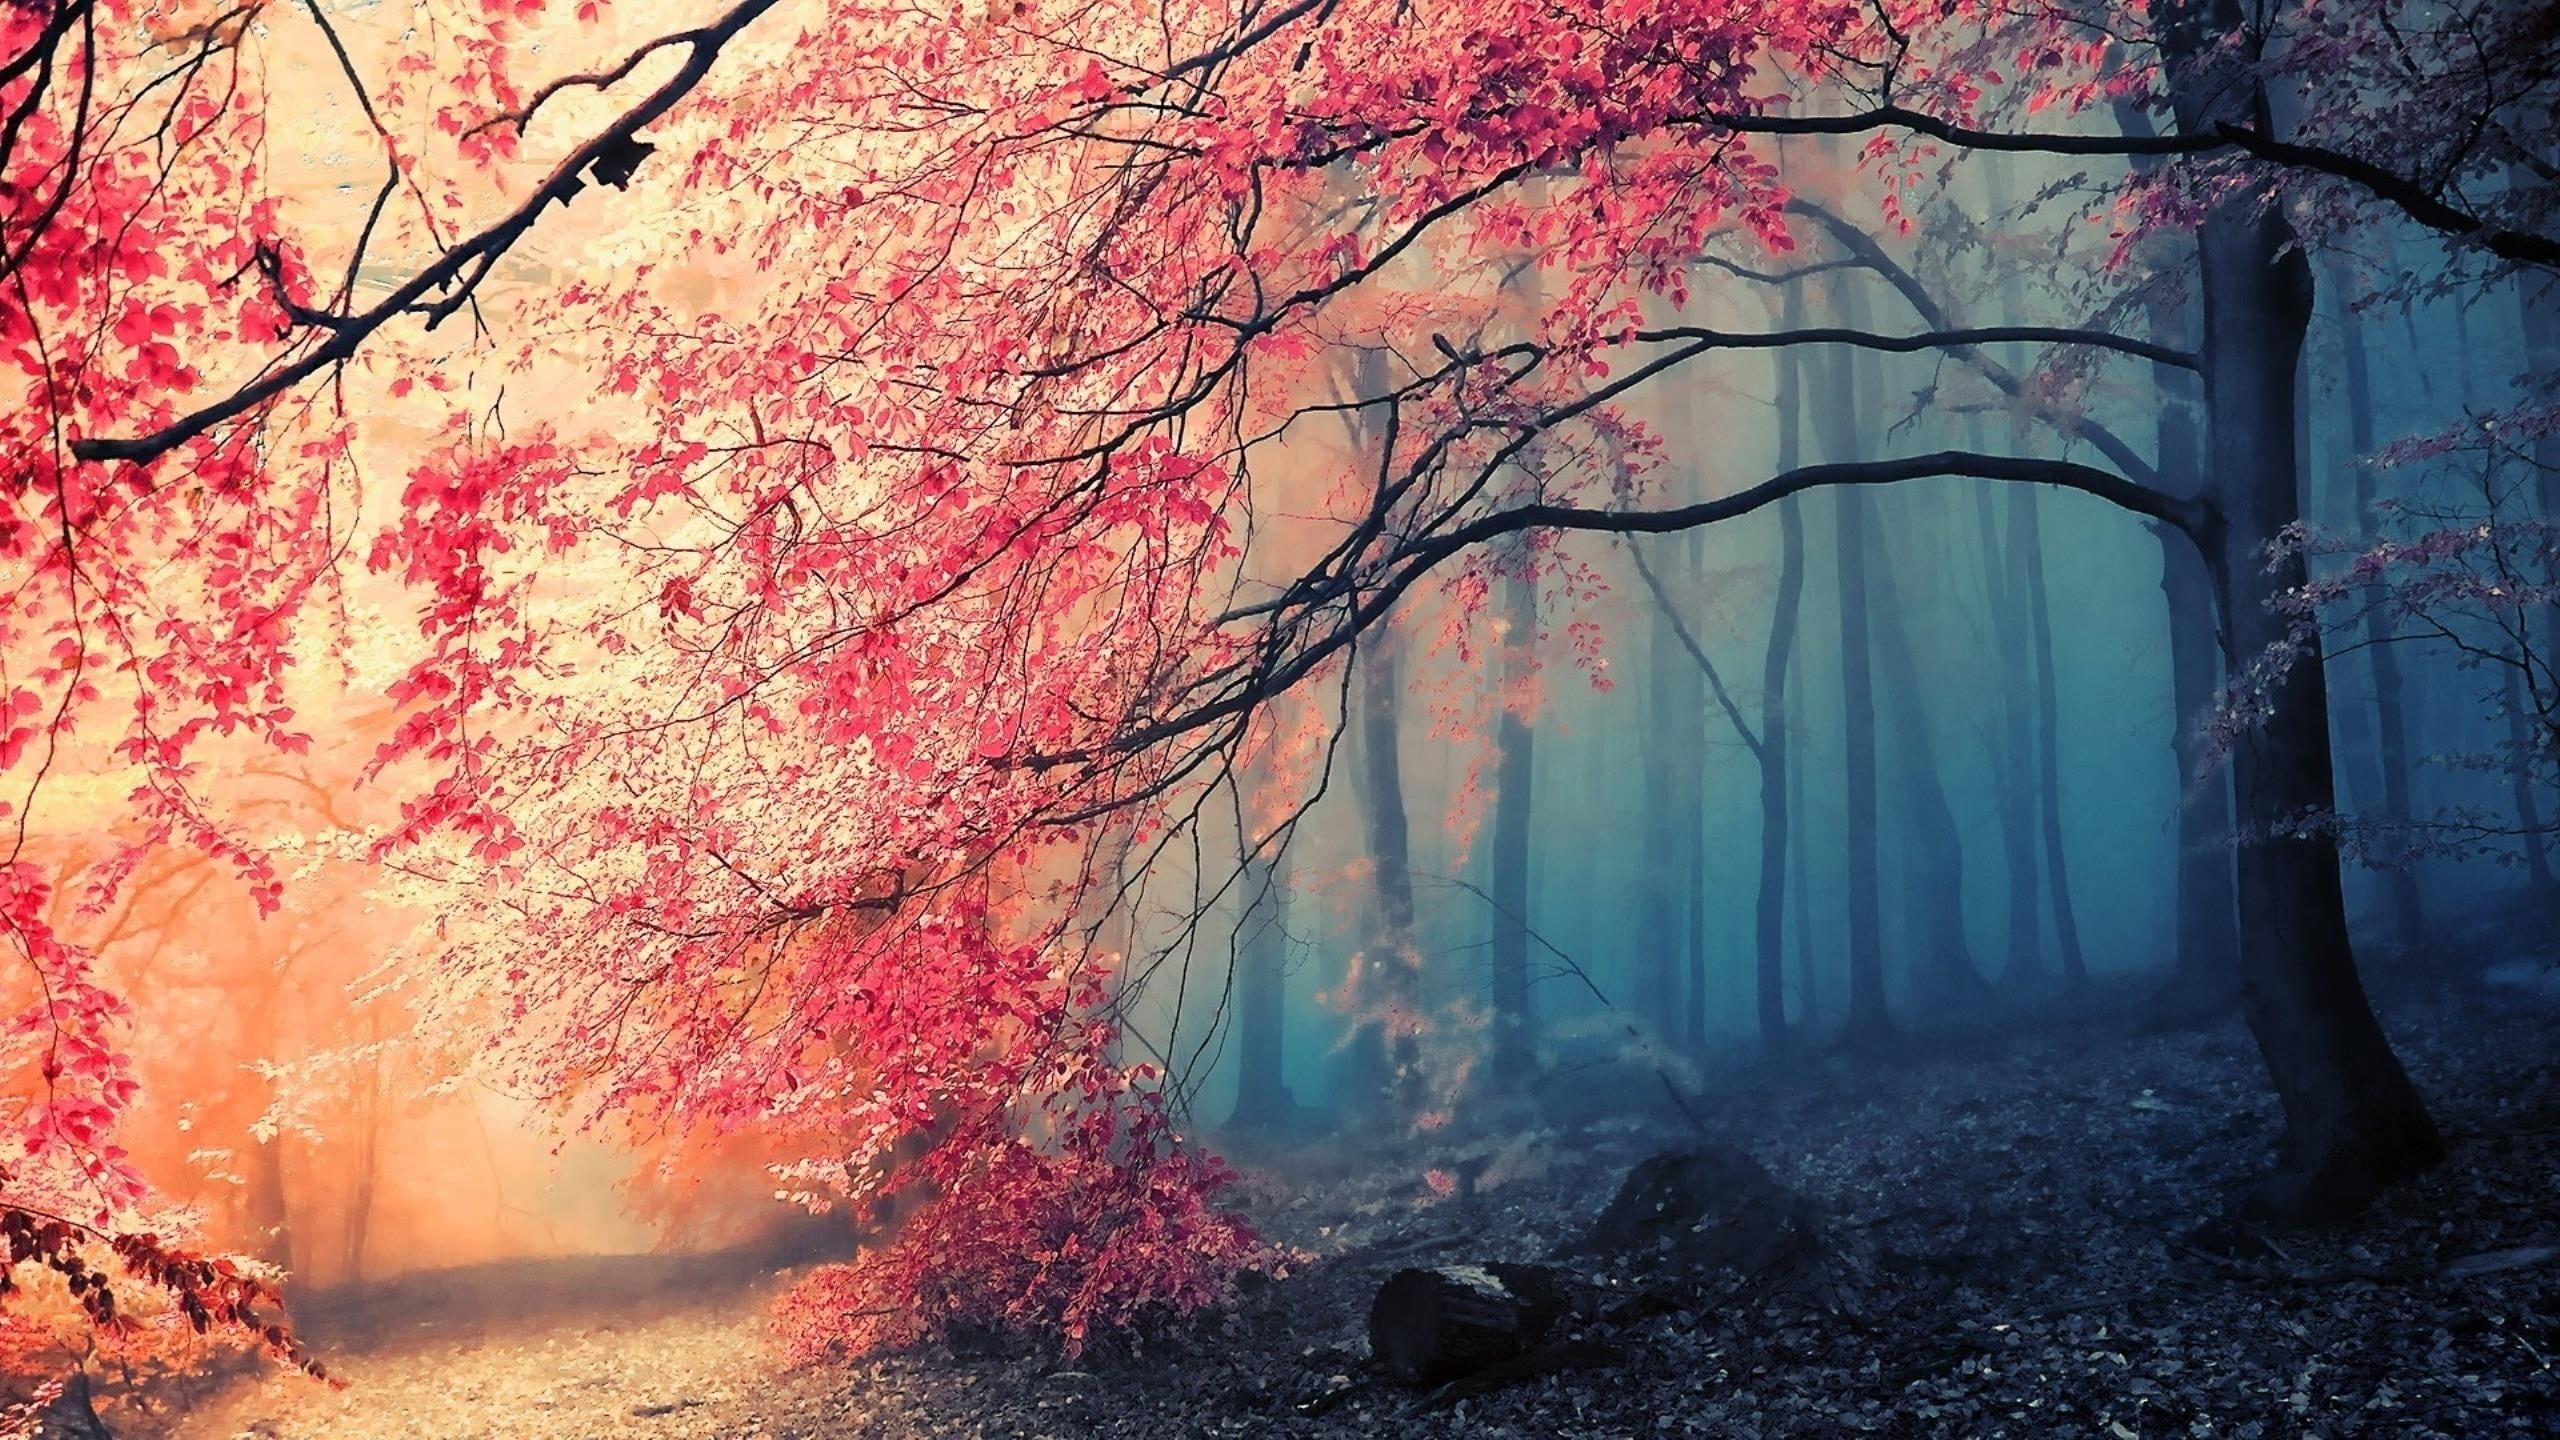 Res: 2560x1440, sakura tree HD wallpaper